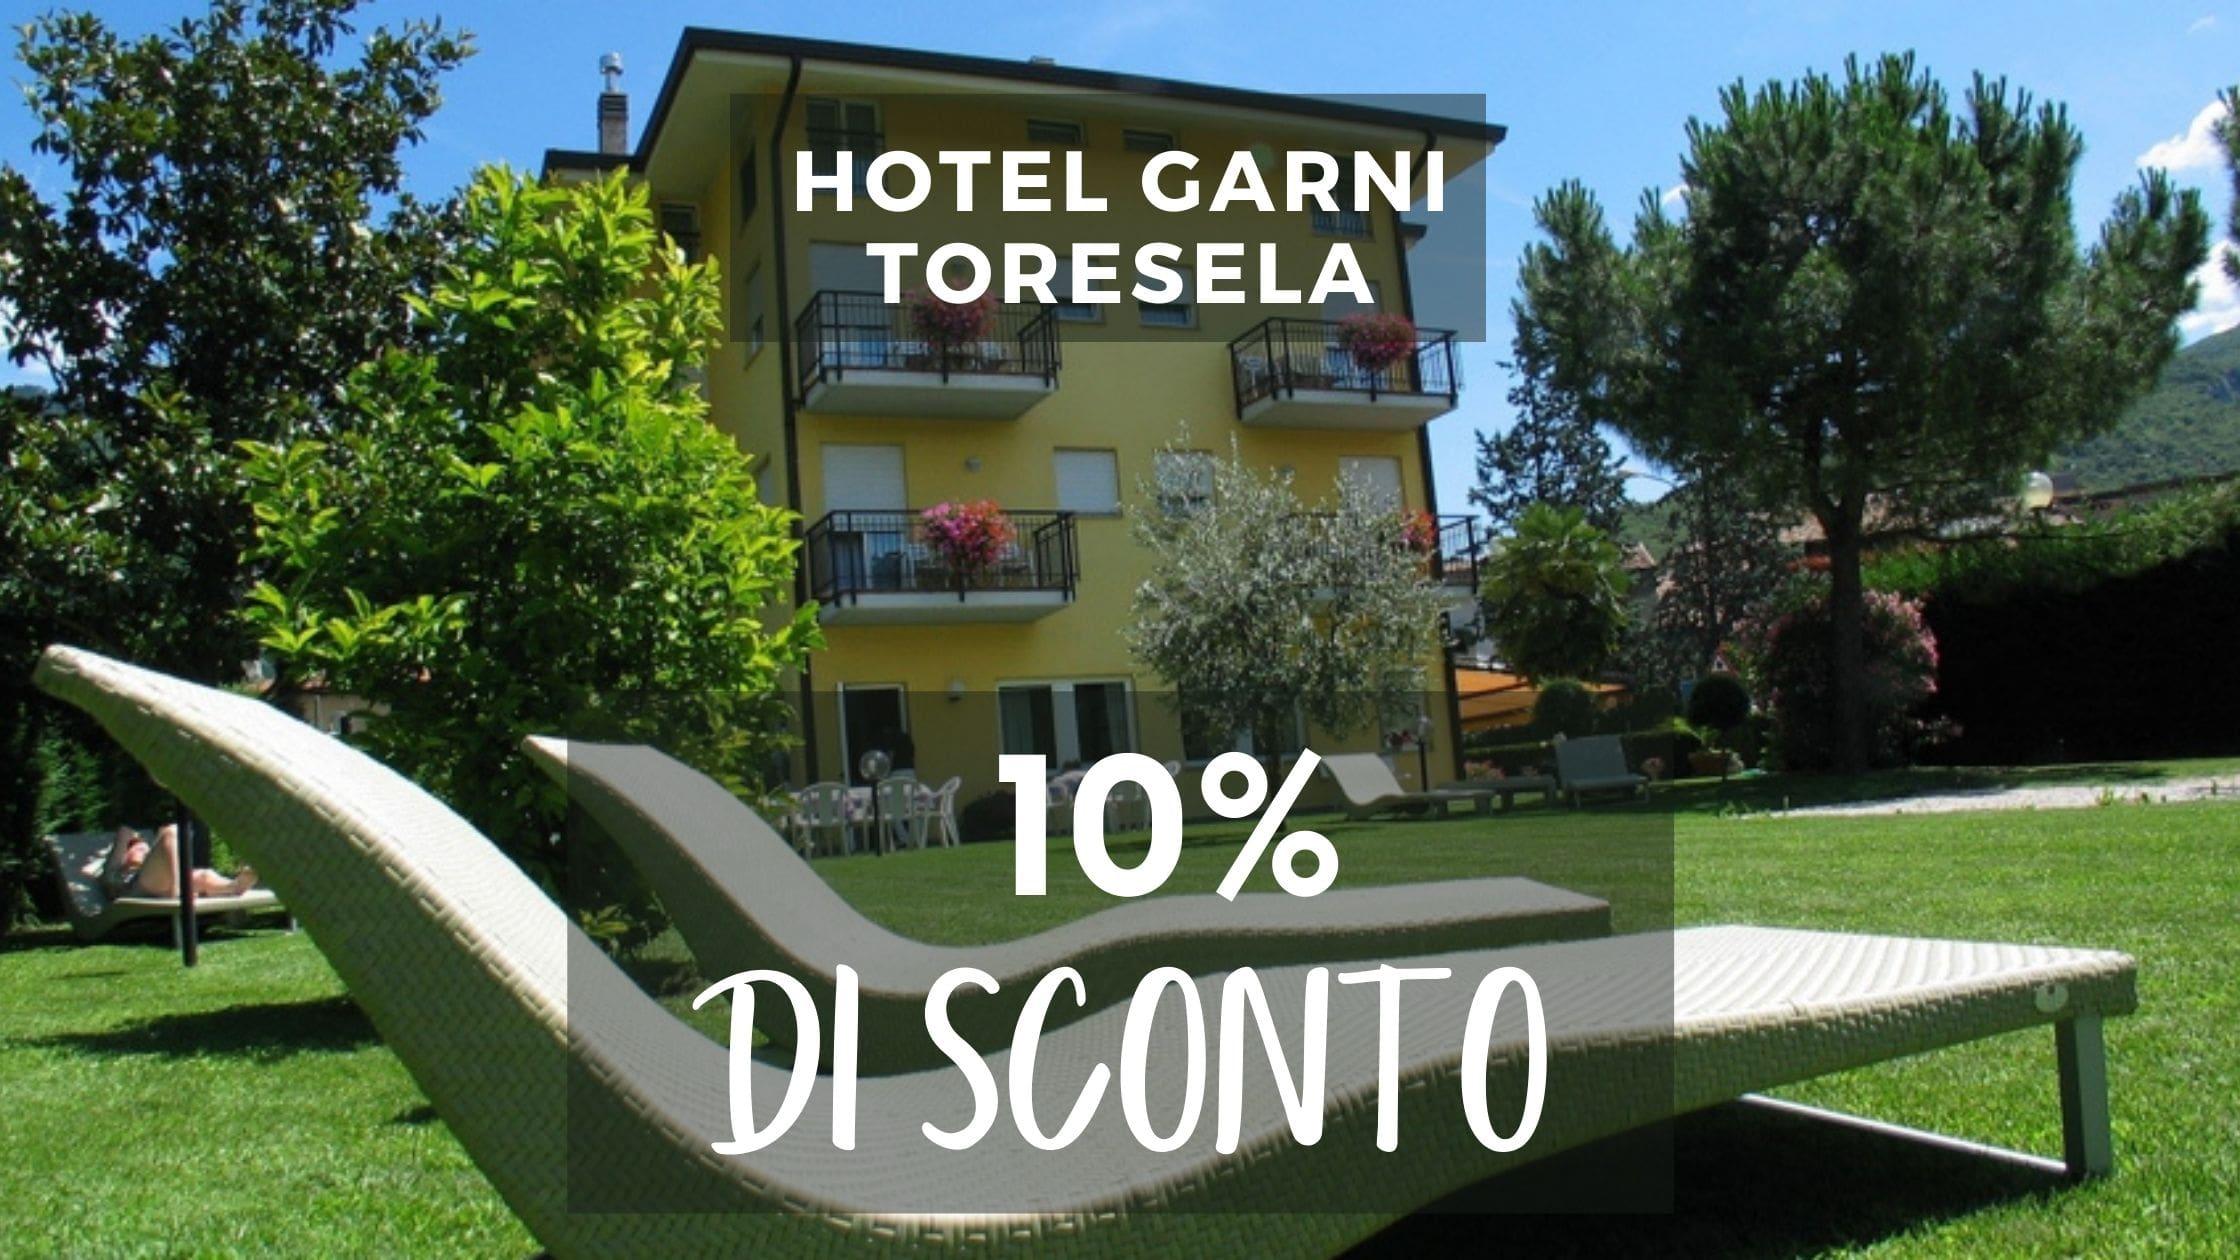 10% di sconto per i clienti dle Hotel Garni Toresela